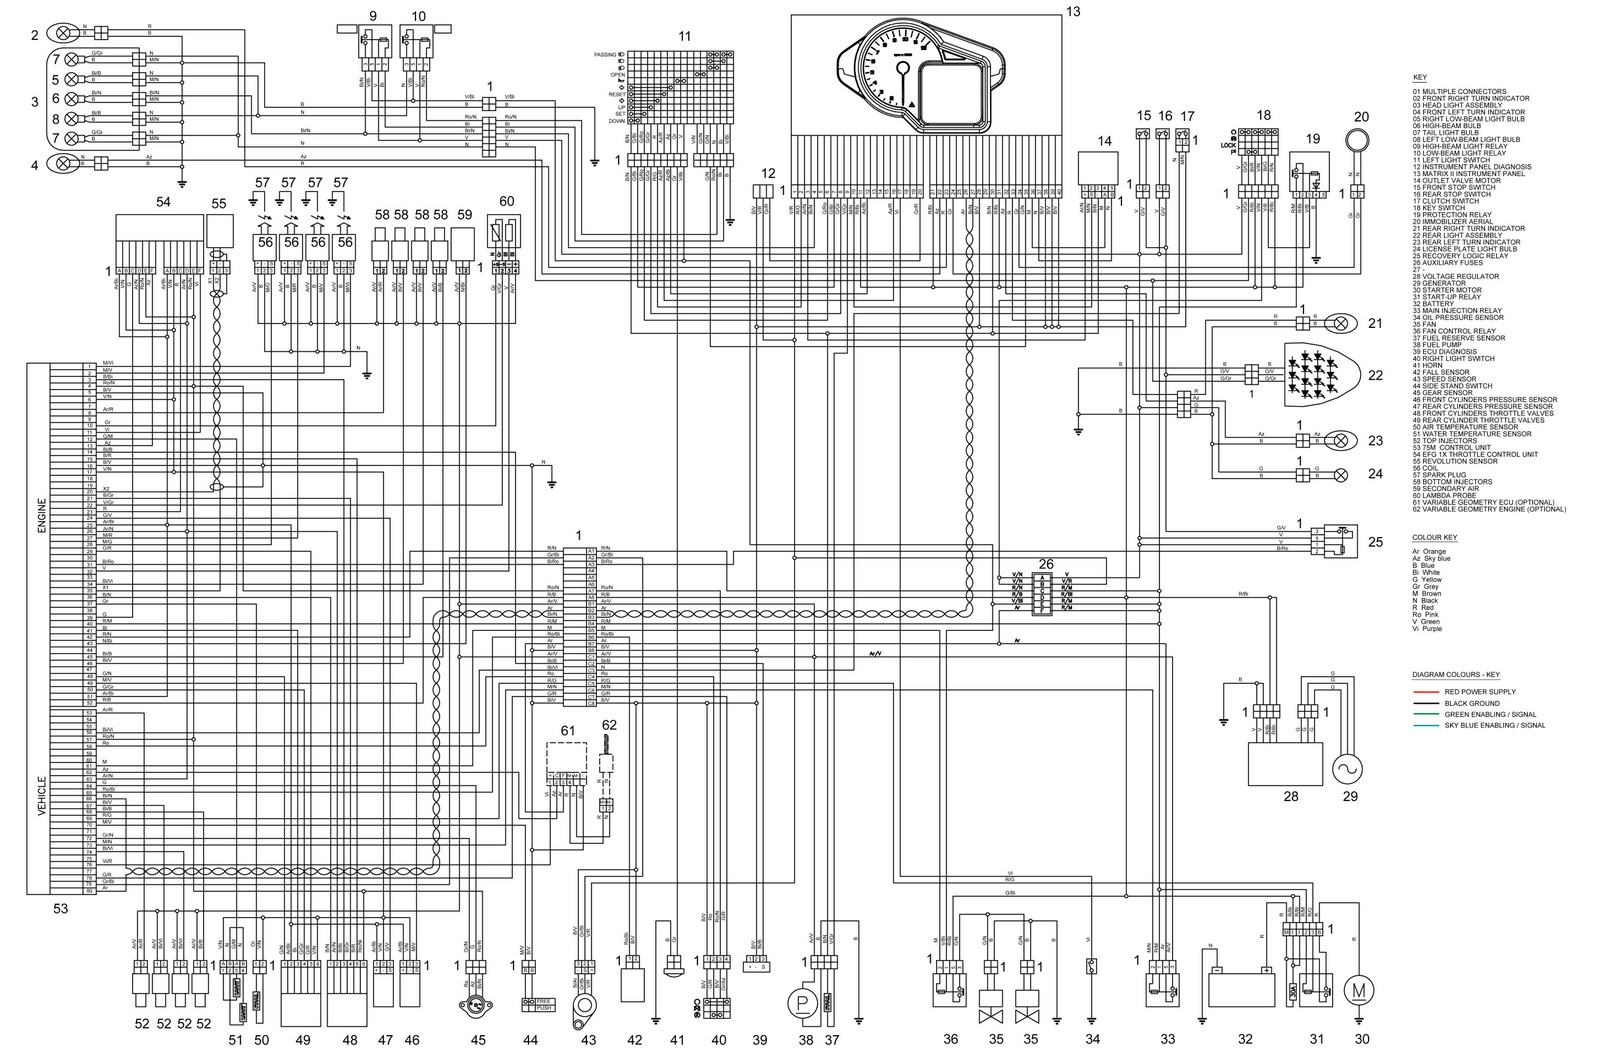 small resolution of rsv4 wiring diagram motor gp photos aprilia rsv4 wiring diagram aprilia rsv4 wiring diagram